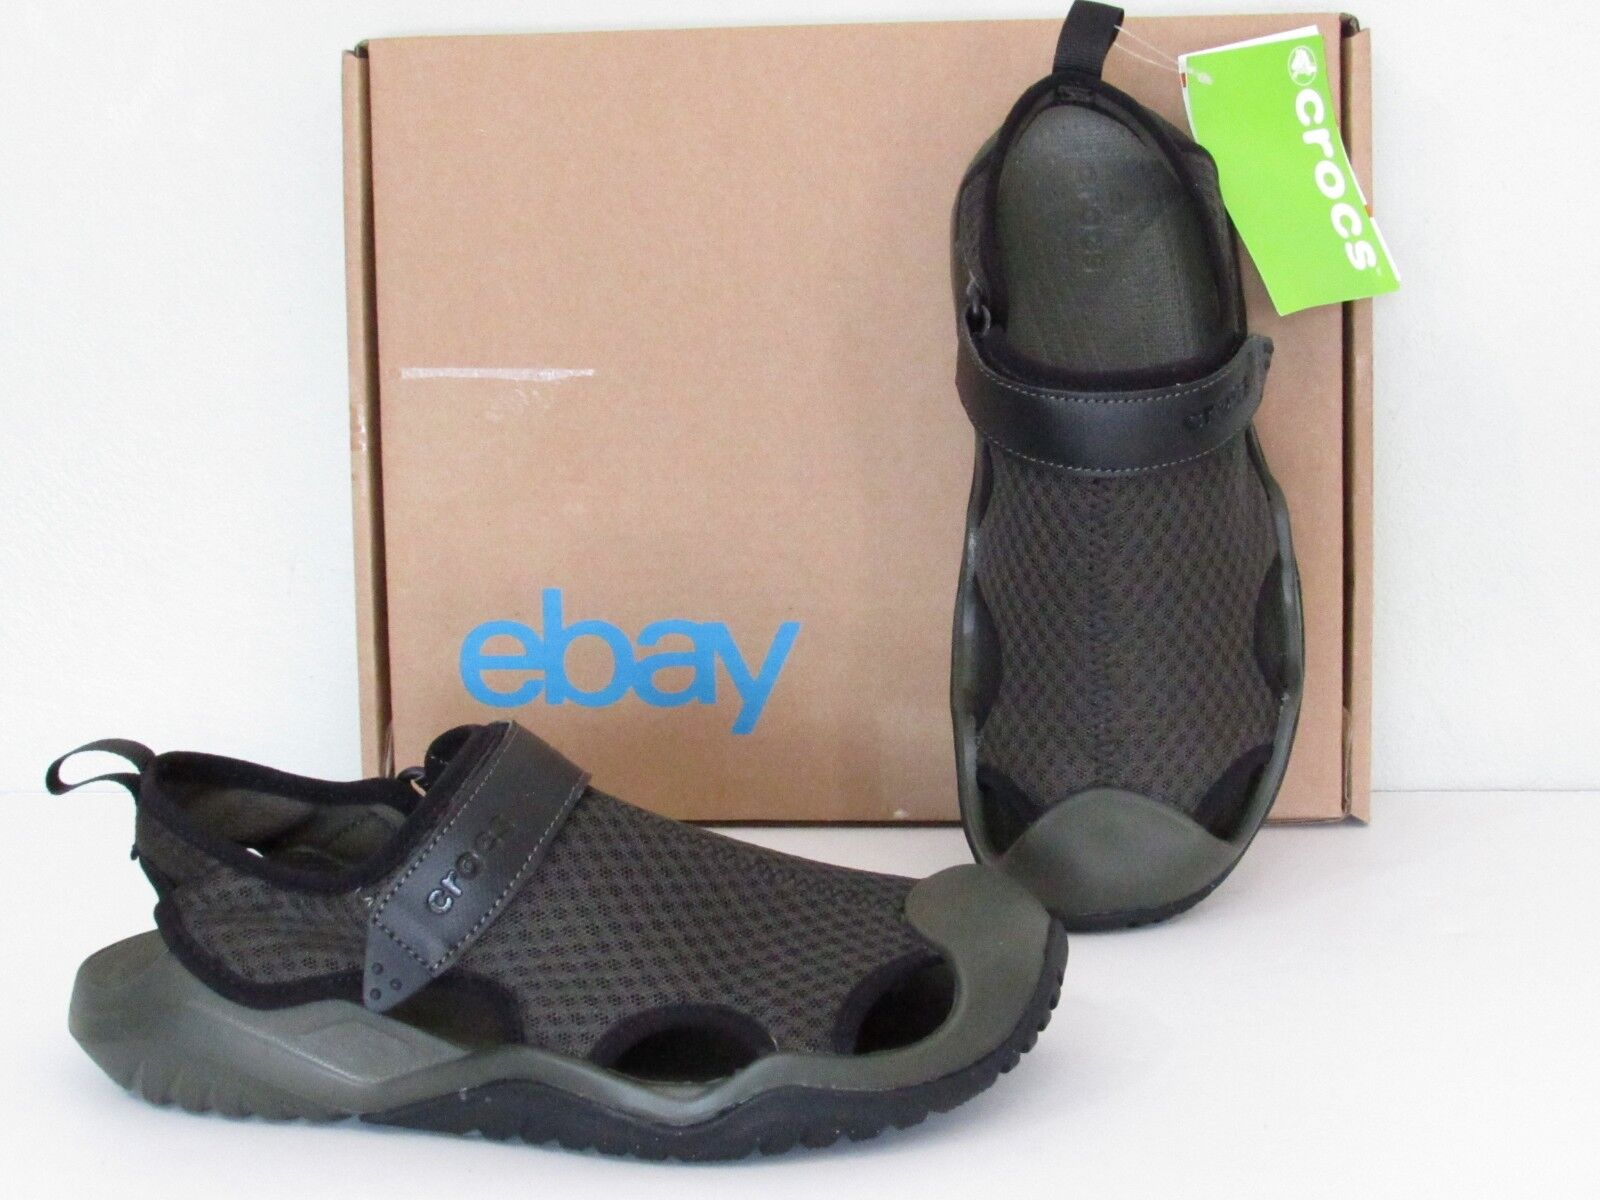 CROCS Swiftwater Lightweight Sport Sandals Shoes Pick Navy, Green Mens Size 7, 8 1